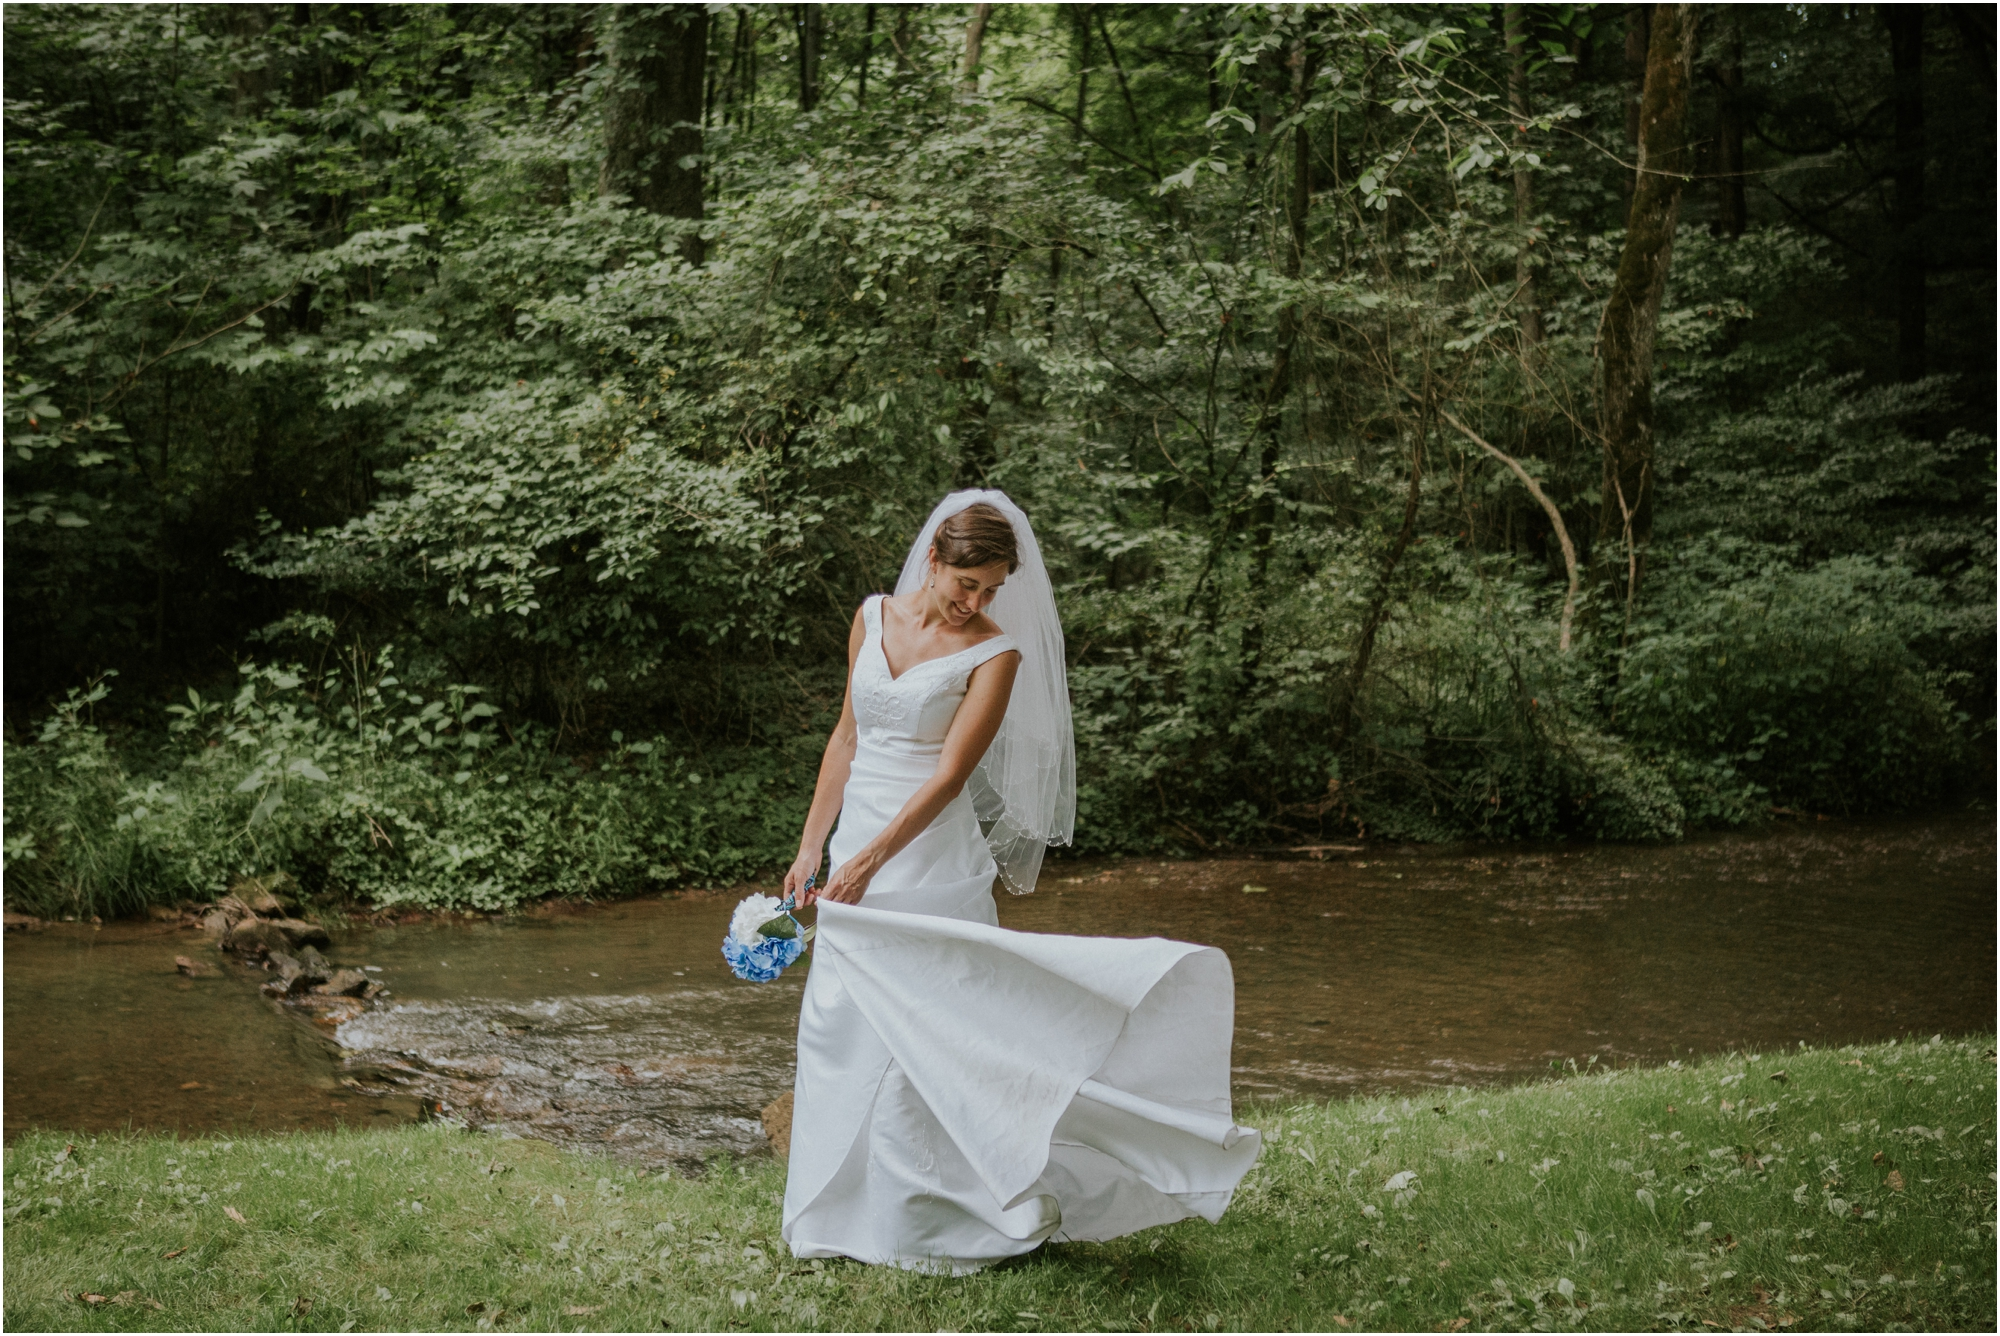 sugar-hollow-park-bristol-virginia-wedding-intimate-woodsy-black-forest-ceremony-adventurous-couple_0095.jpg